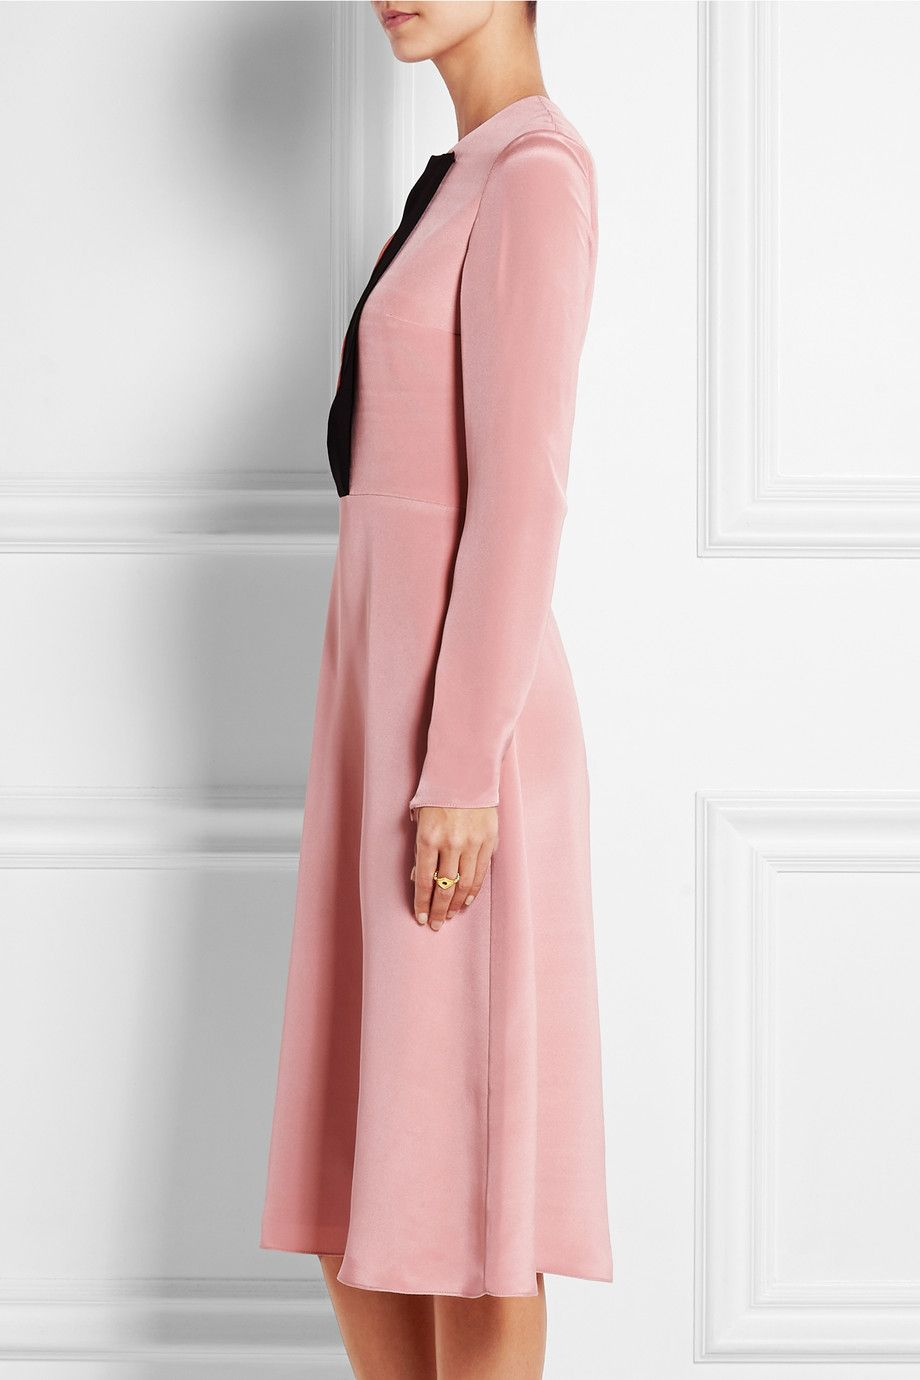 Roksanda|Rhode color-block silk-blend satin dress|NET-A-PORTER.COM